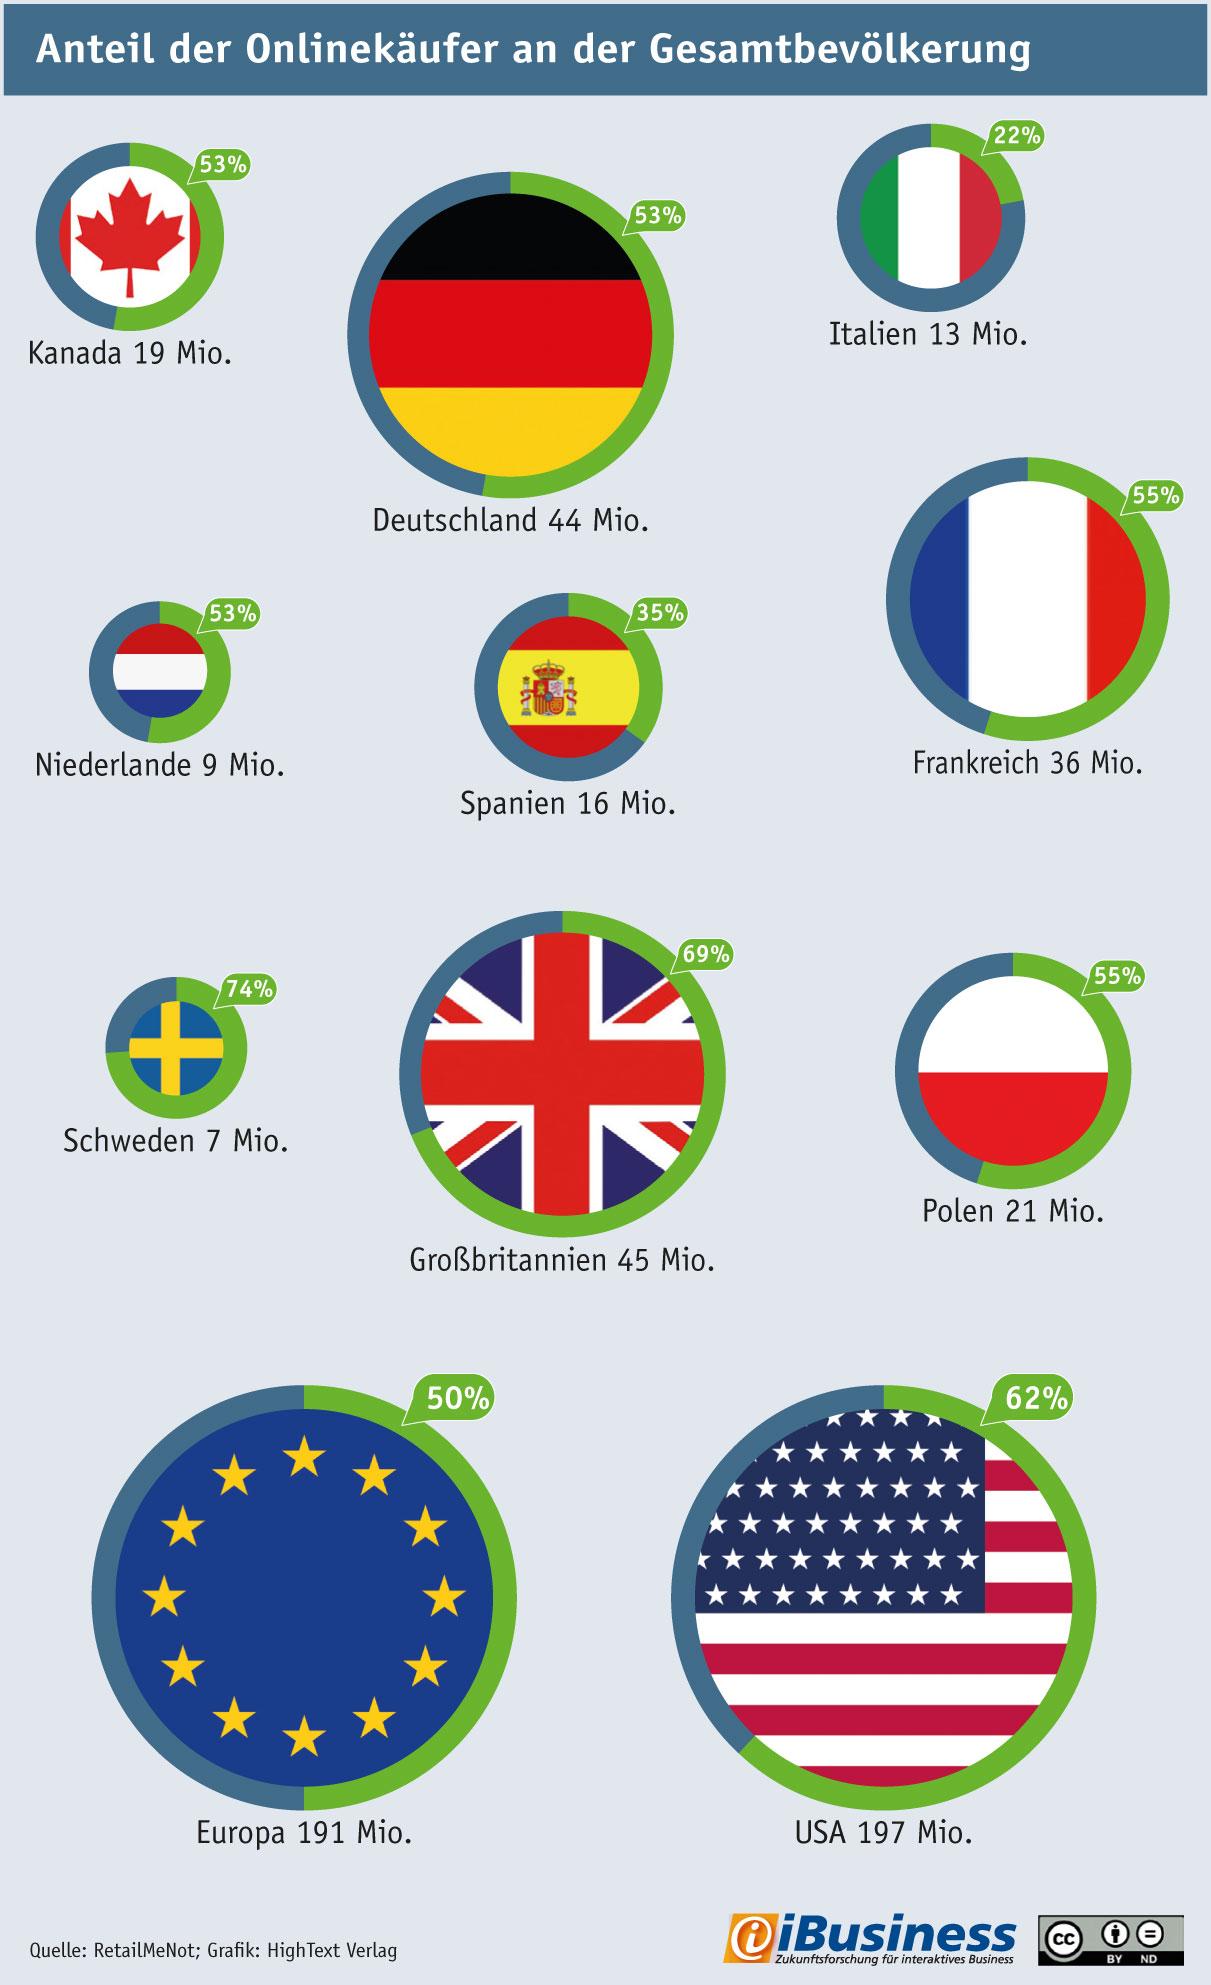 Infografik: Anteil der Onlinekäufer an der Gesamtbevölkerung nach Ländern 2015